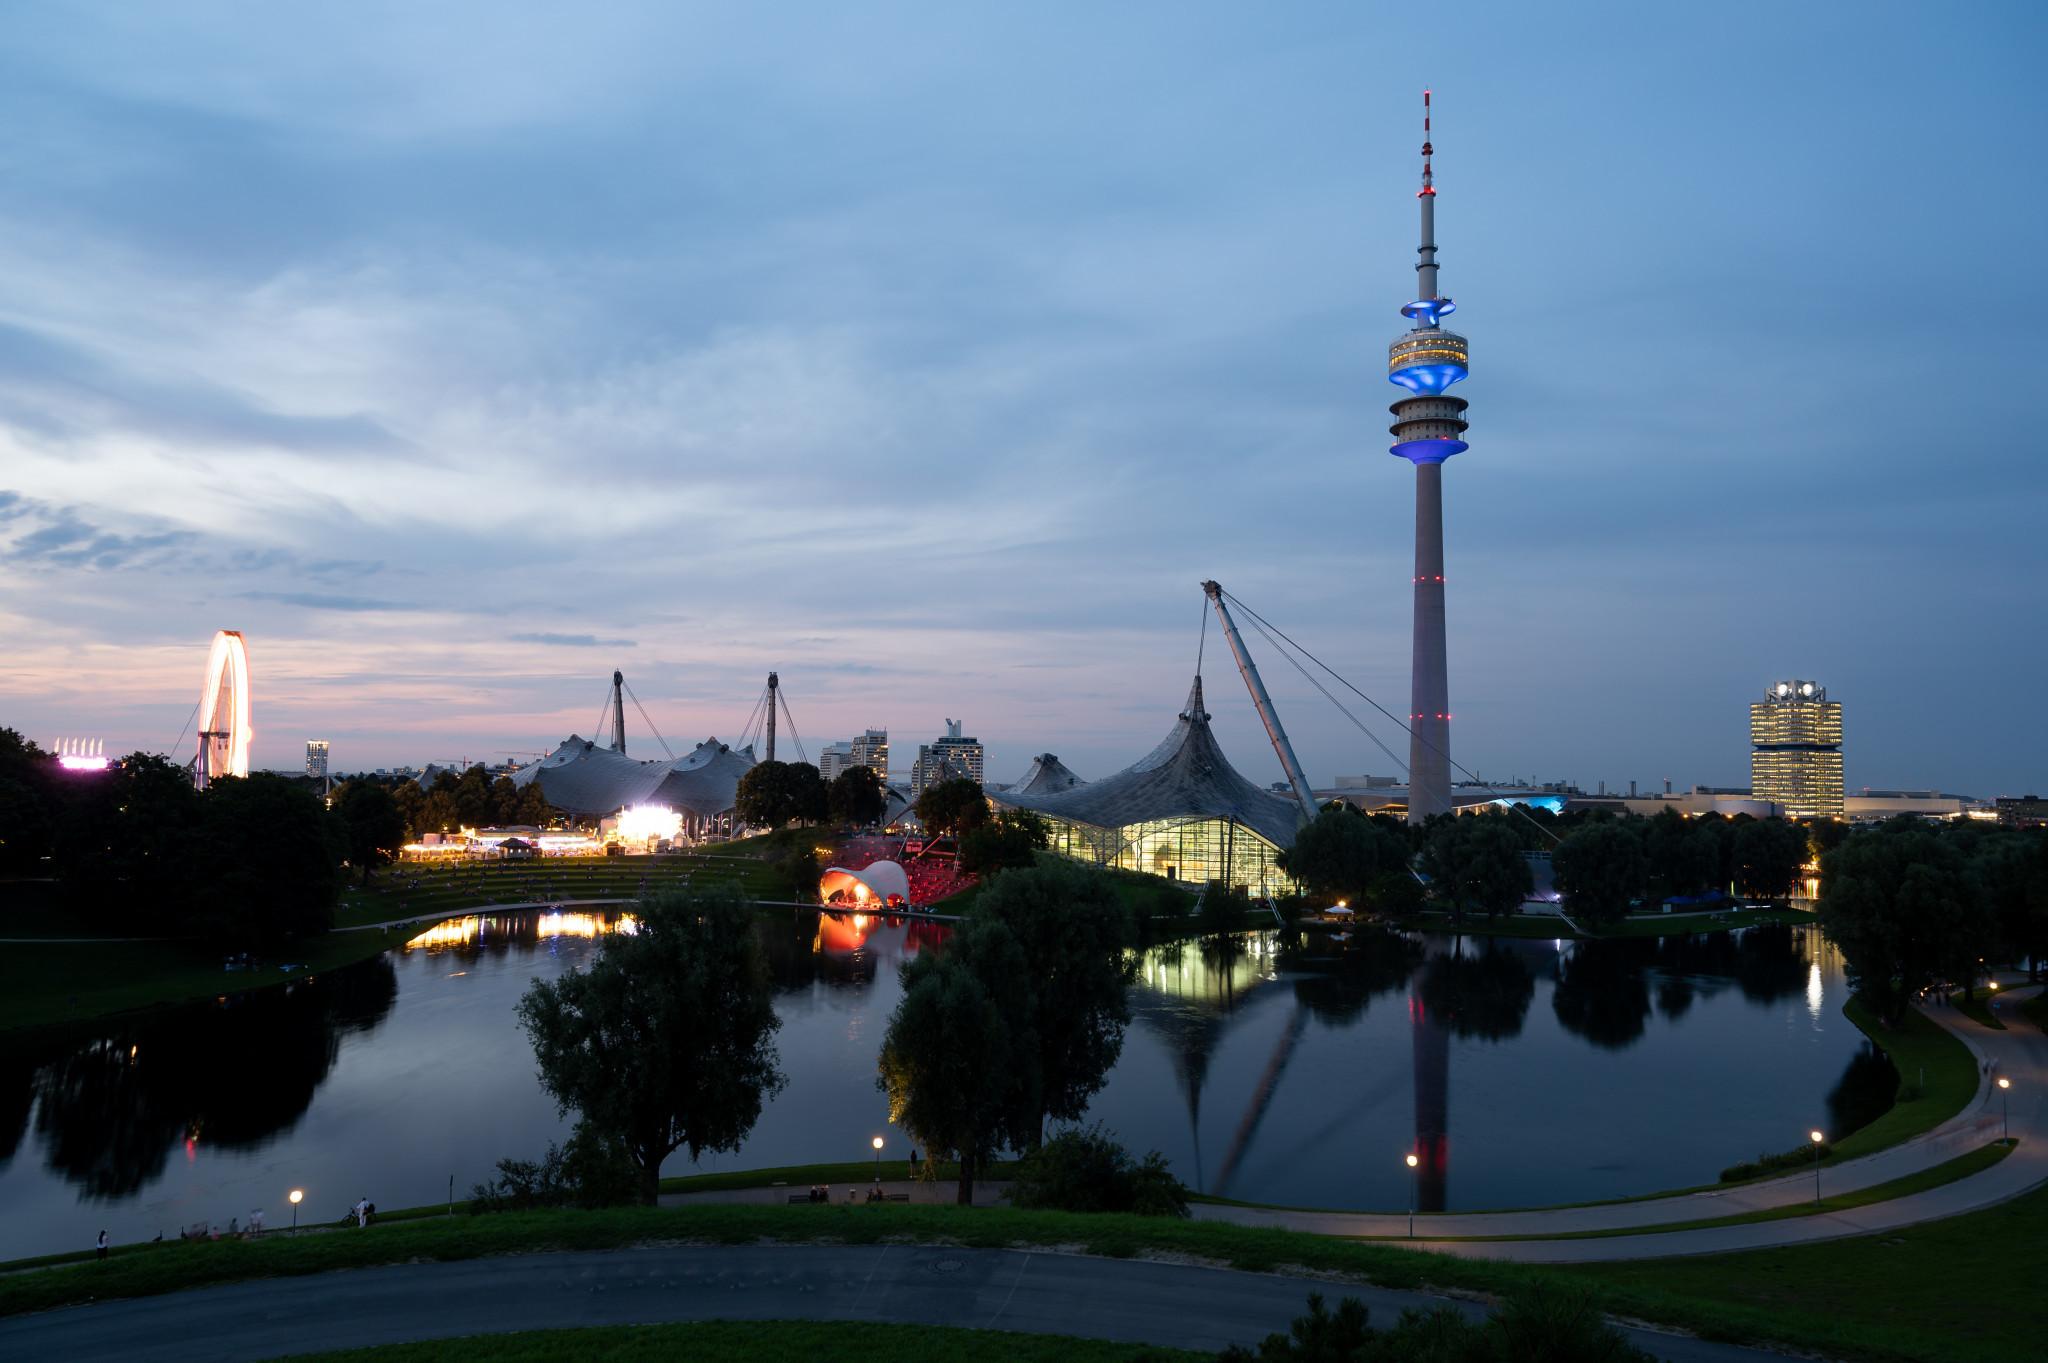 Munich 2022 European Championships partners with venue-planning platform Iventis